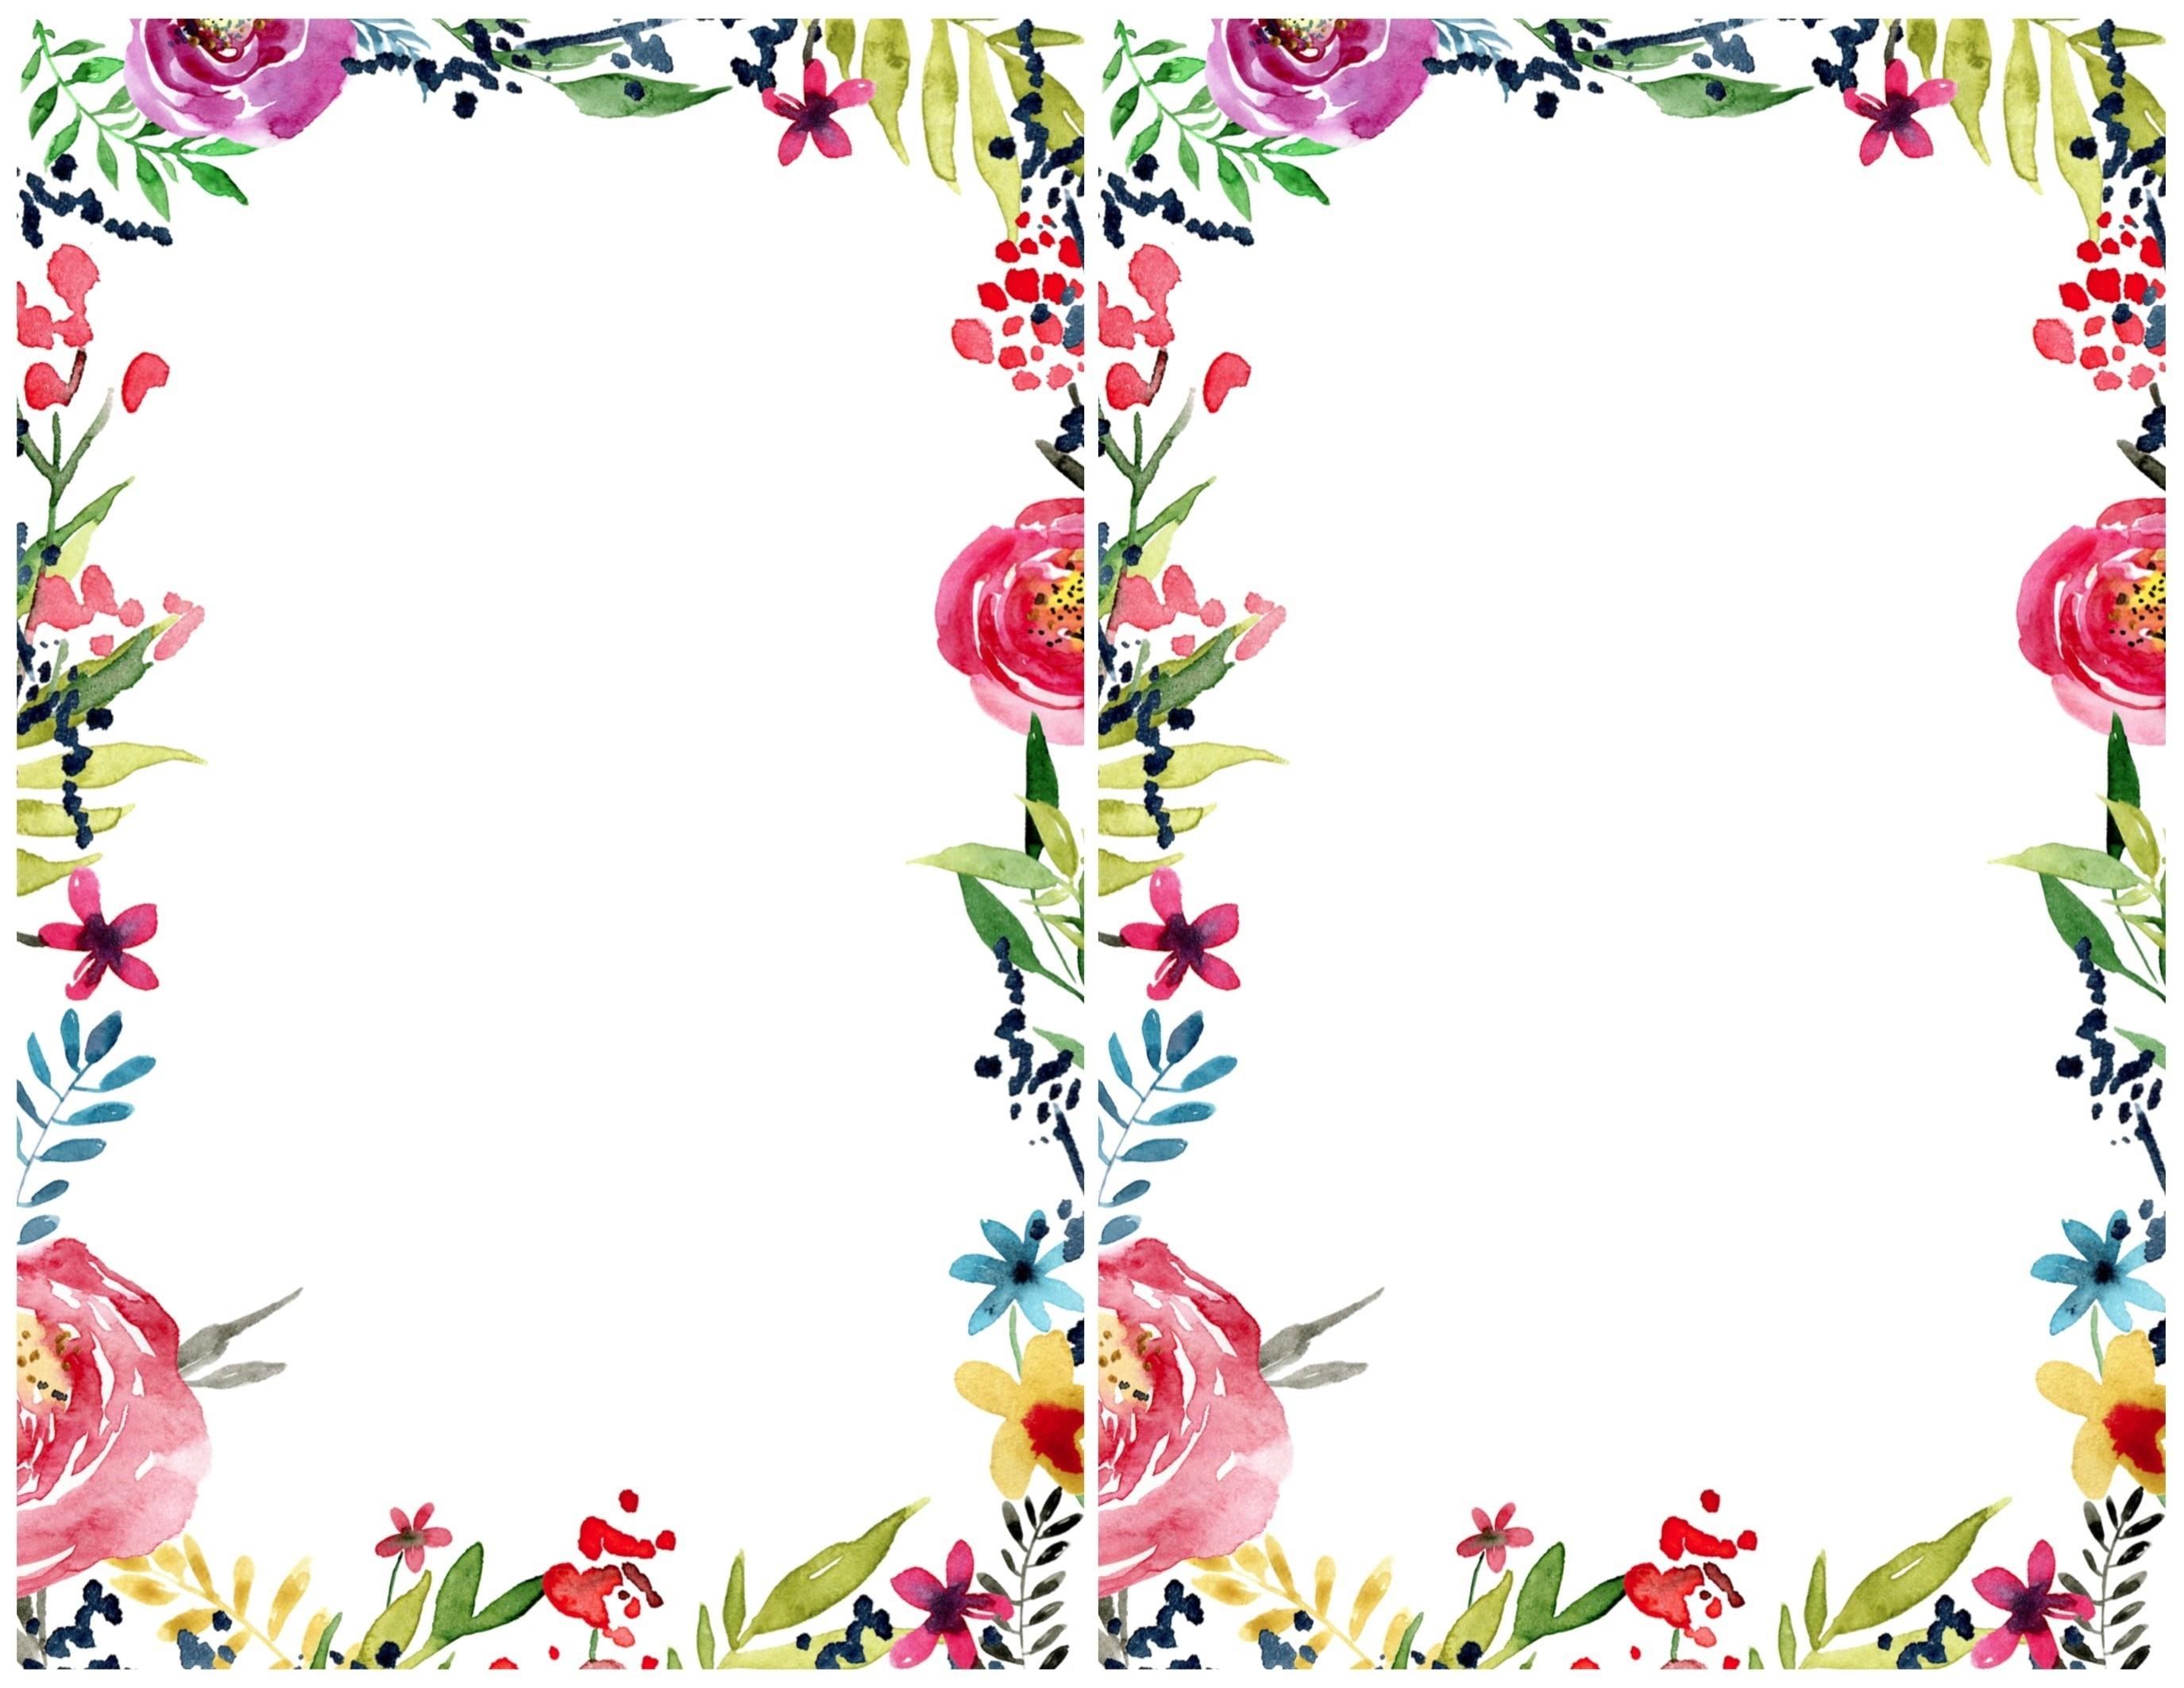 Invitation Templates Free Best Floral Borders Invitations Free - Free Printable Borders